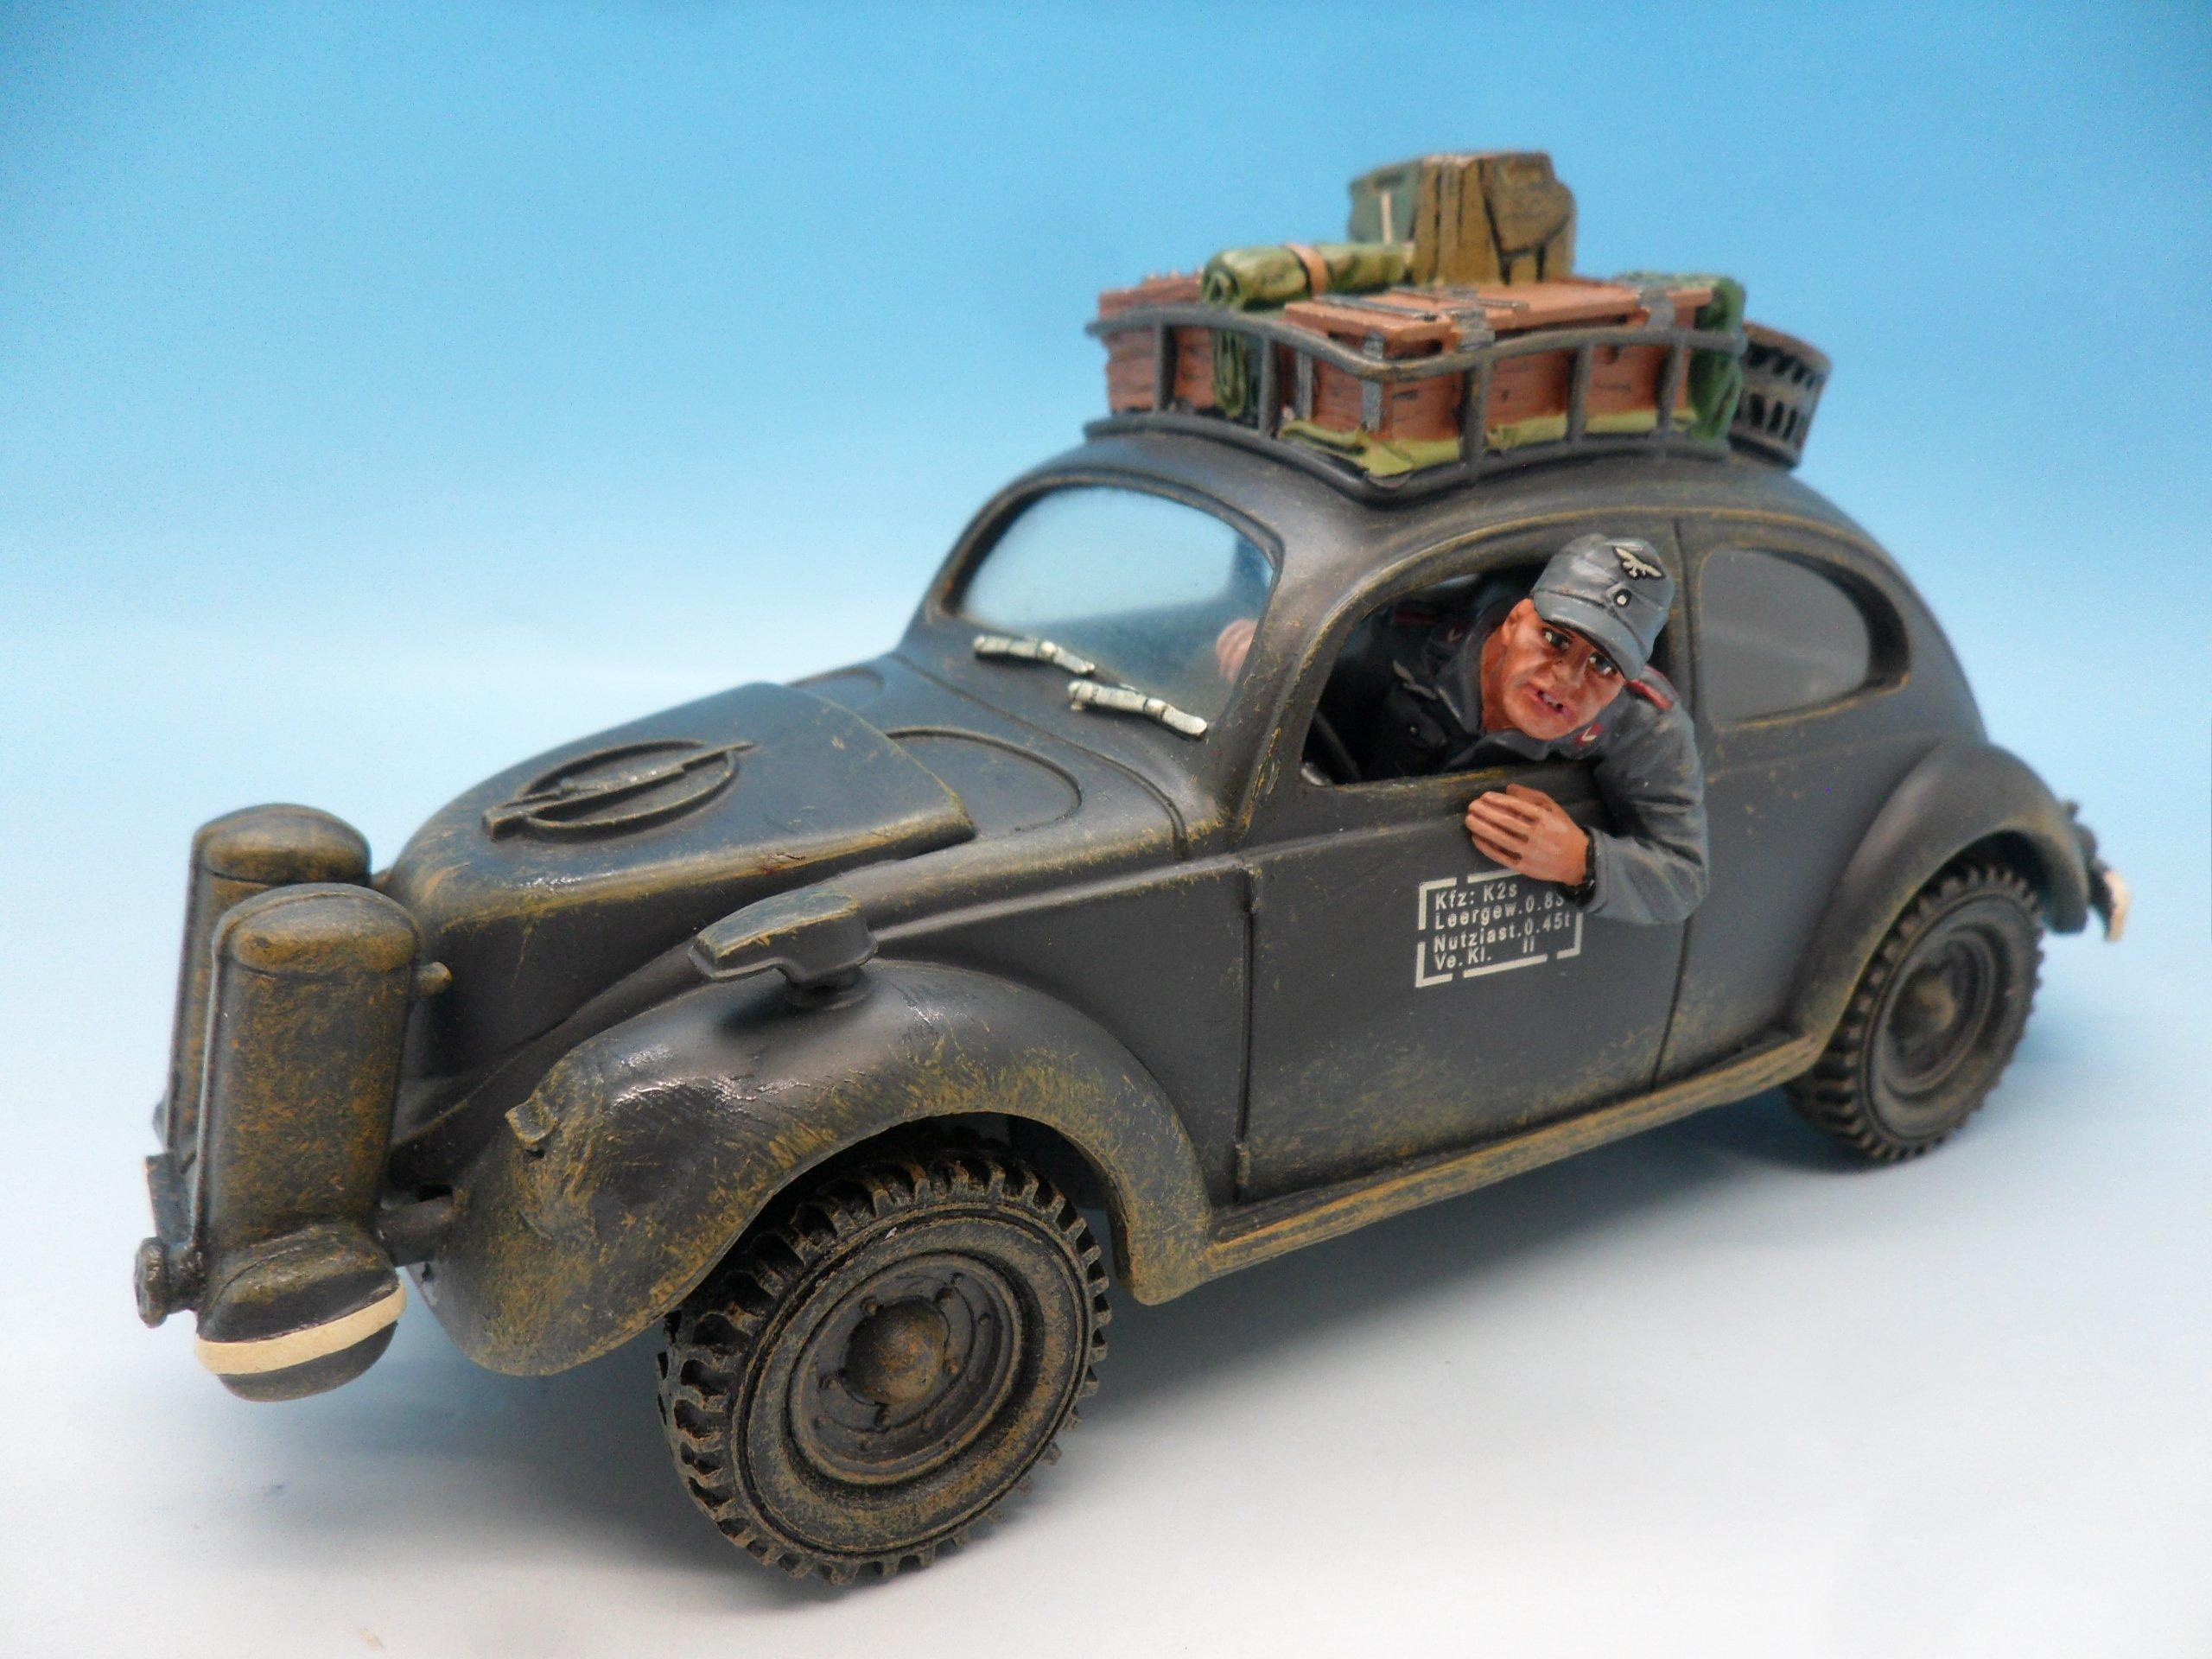 King /& Country WWII Luftwaffe Volkswagen Beetle LW043